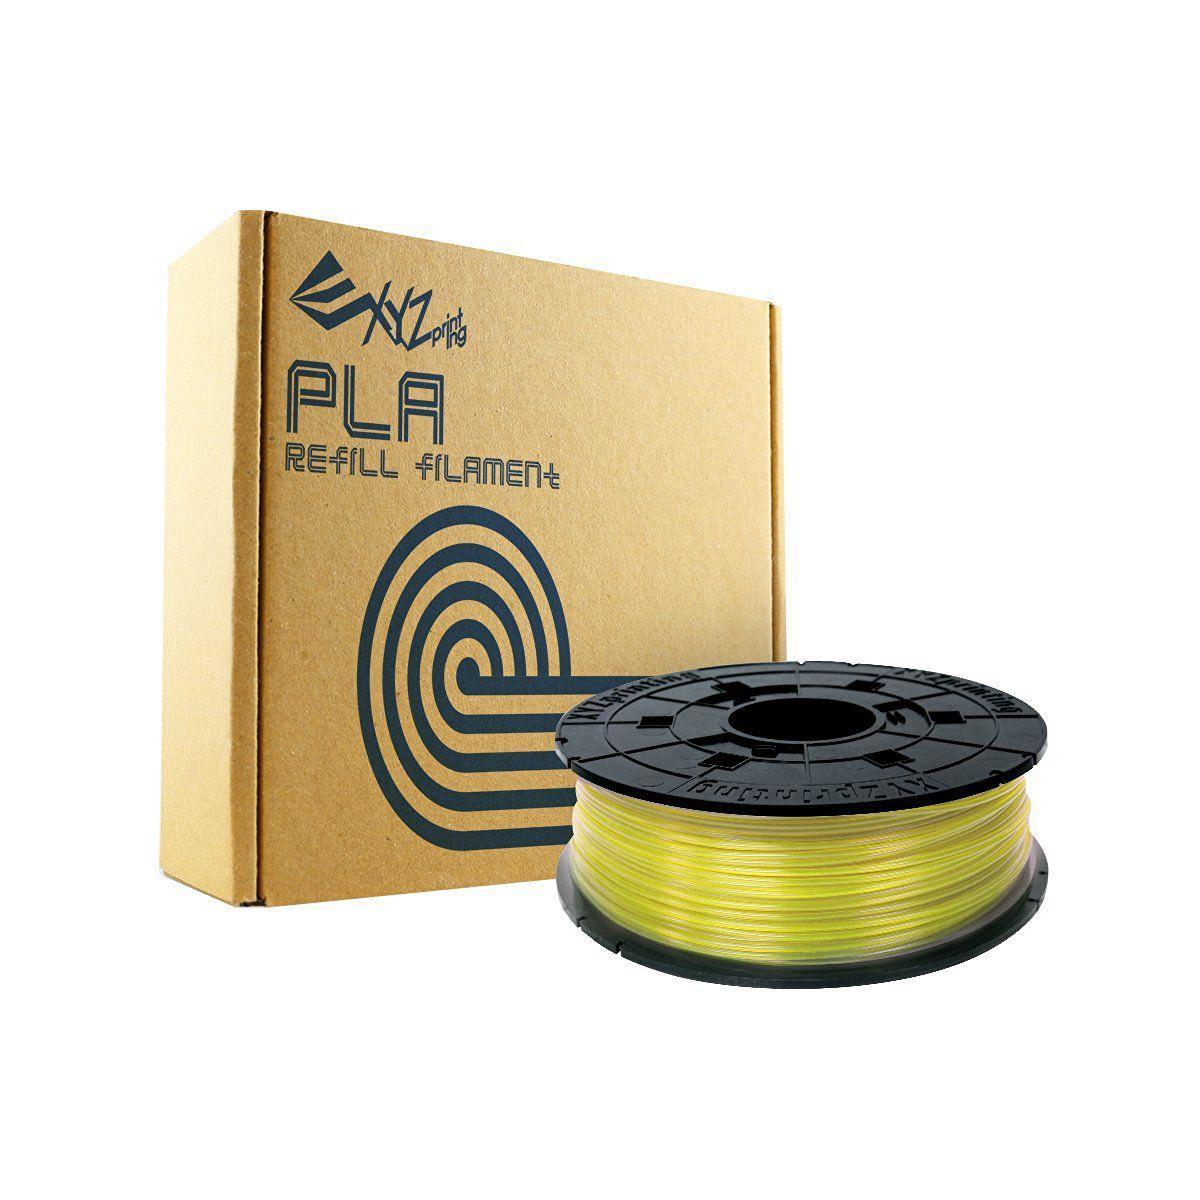 Cartouche xyz printing bobine recharge pla jaune clair - 2% de...